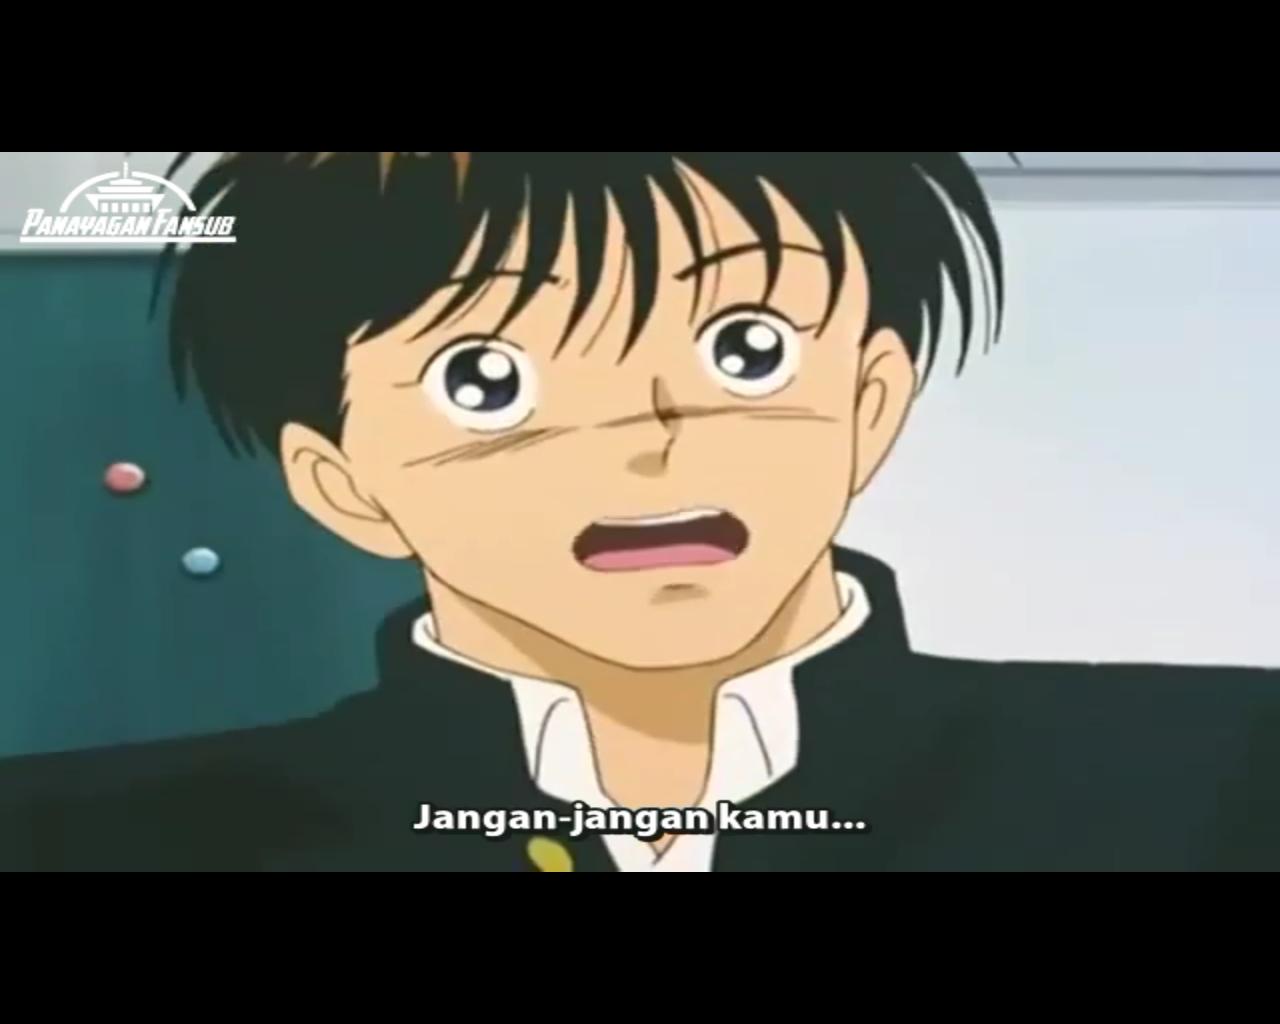 Download Aoki Densetsu Shoot! Episode 01 Subtitle Indonesia